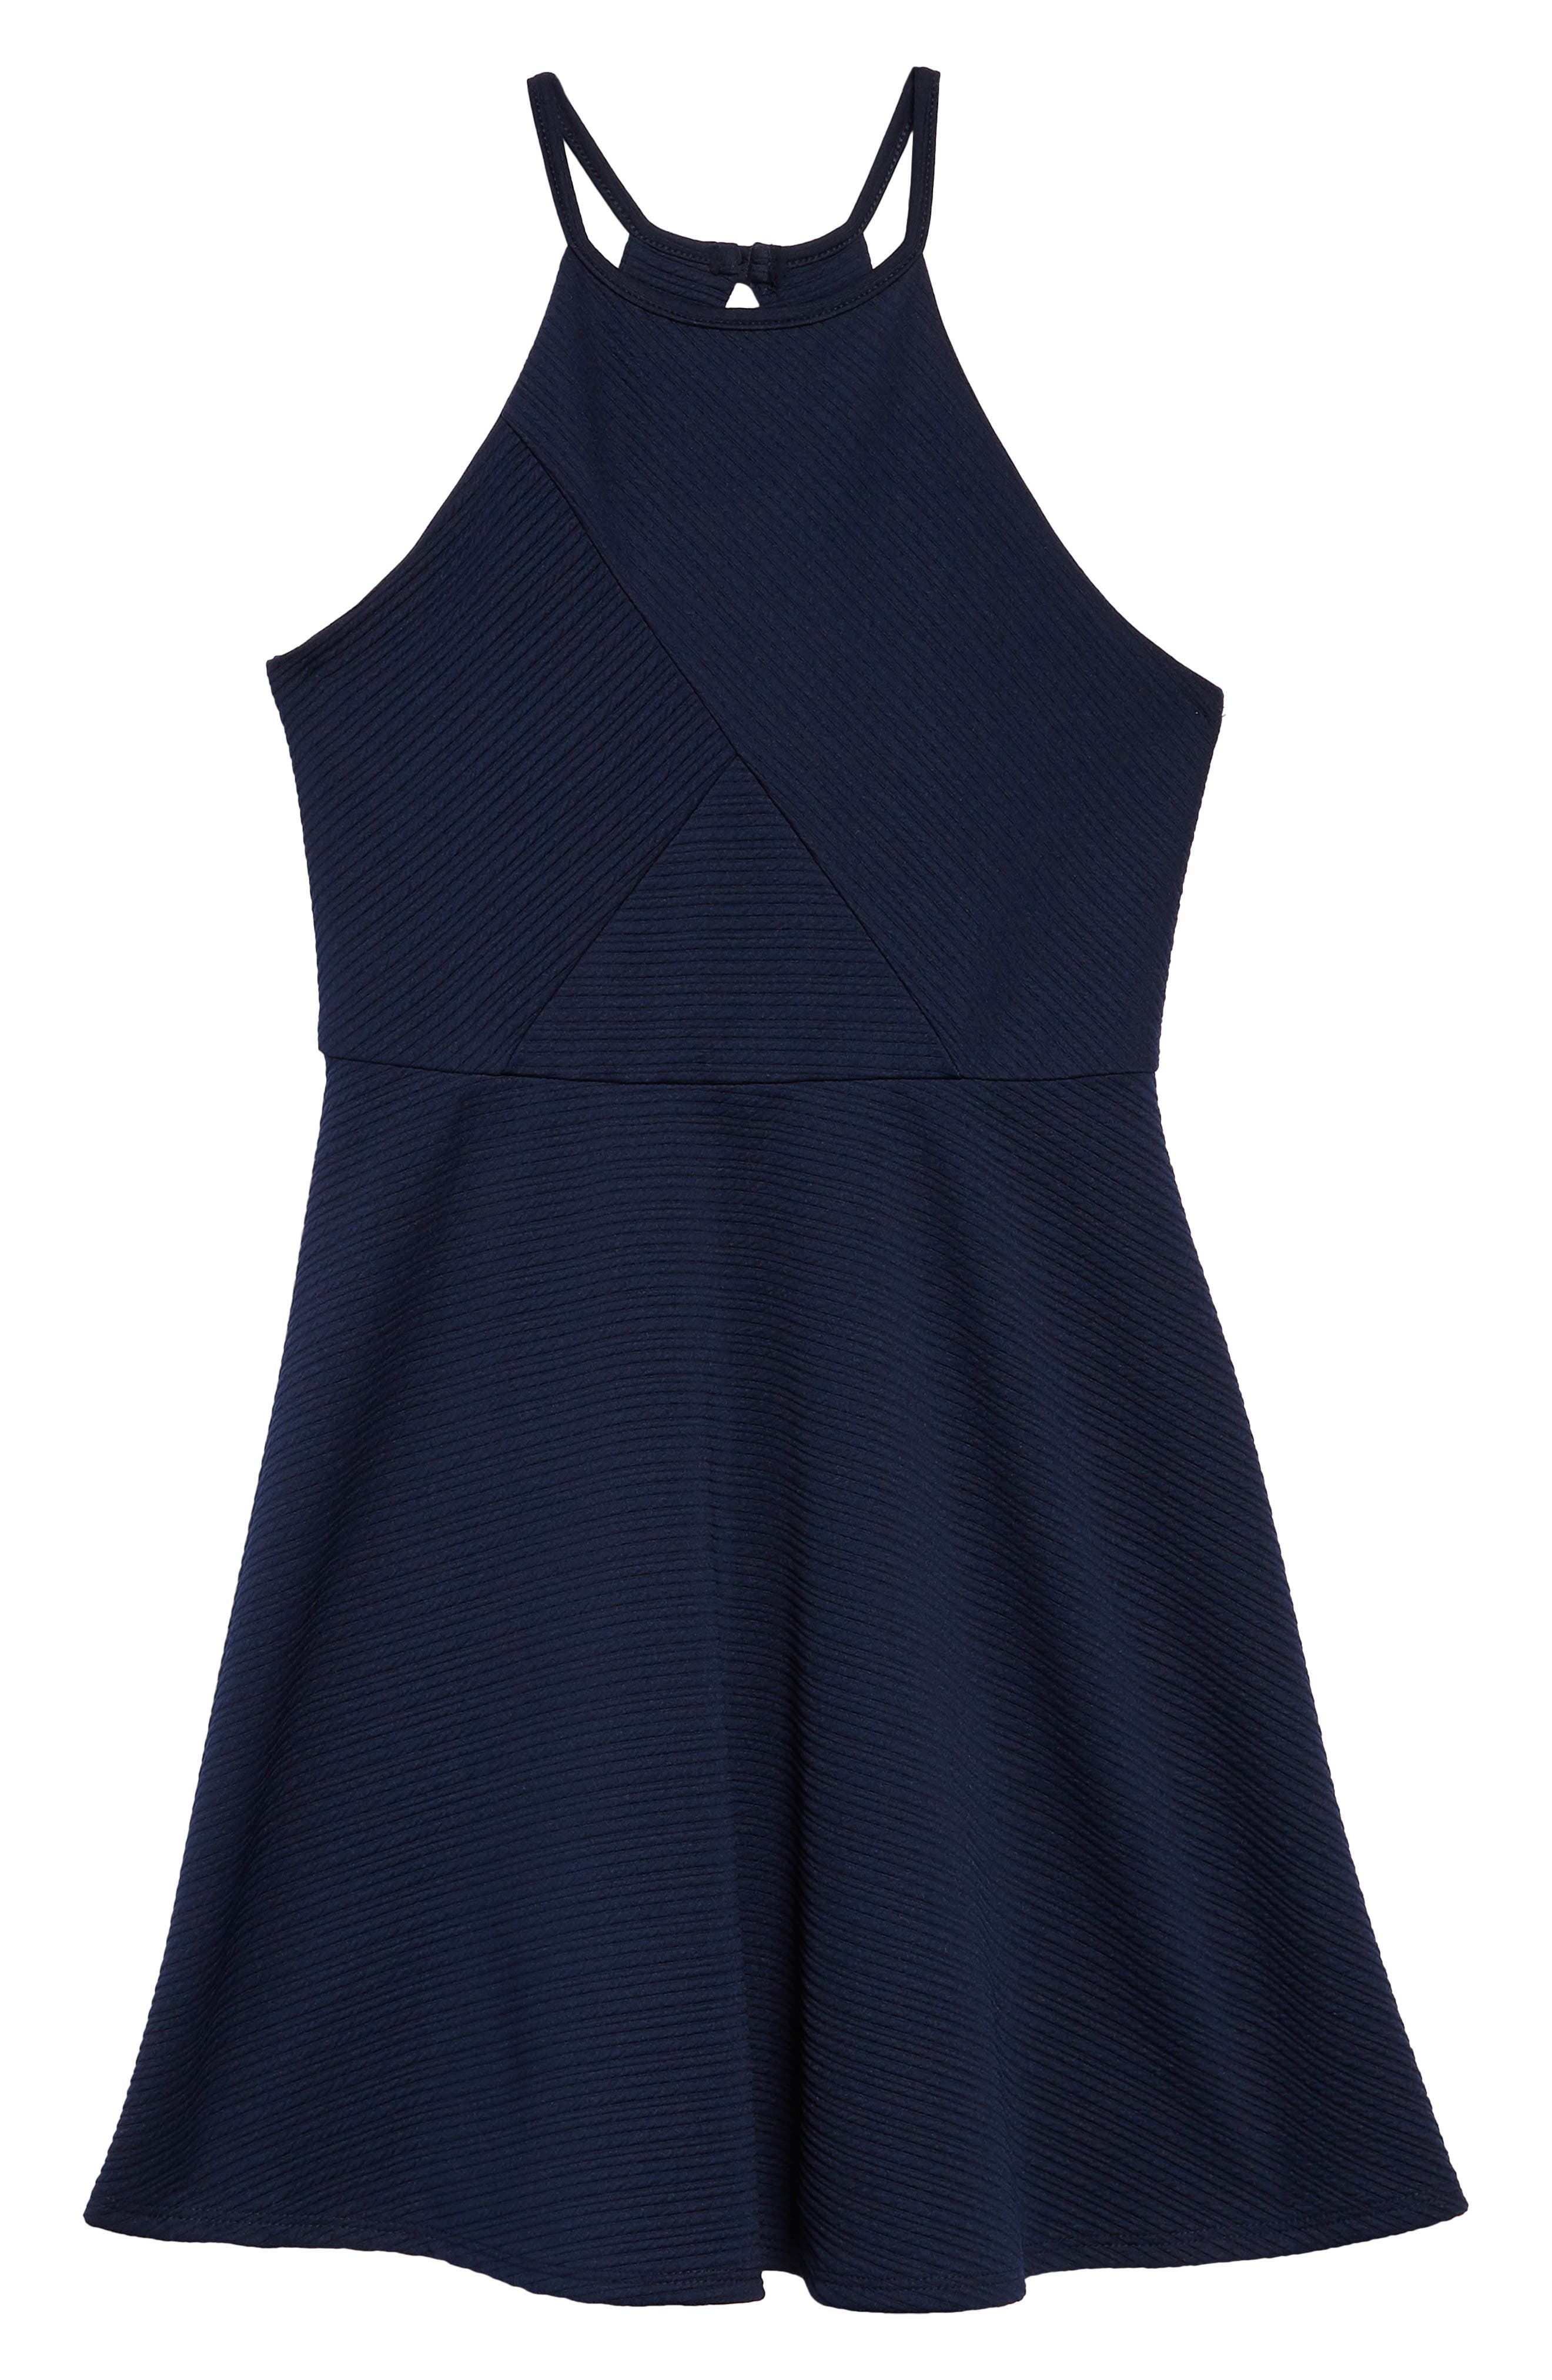 Textured Skater Dress,                         Main,                         color, Navy